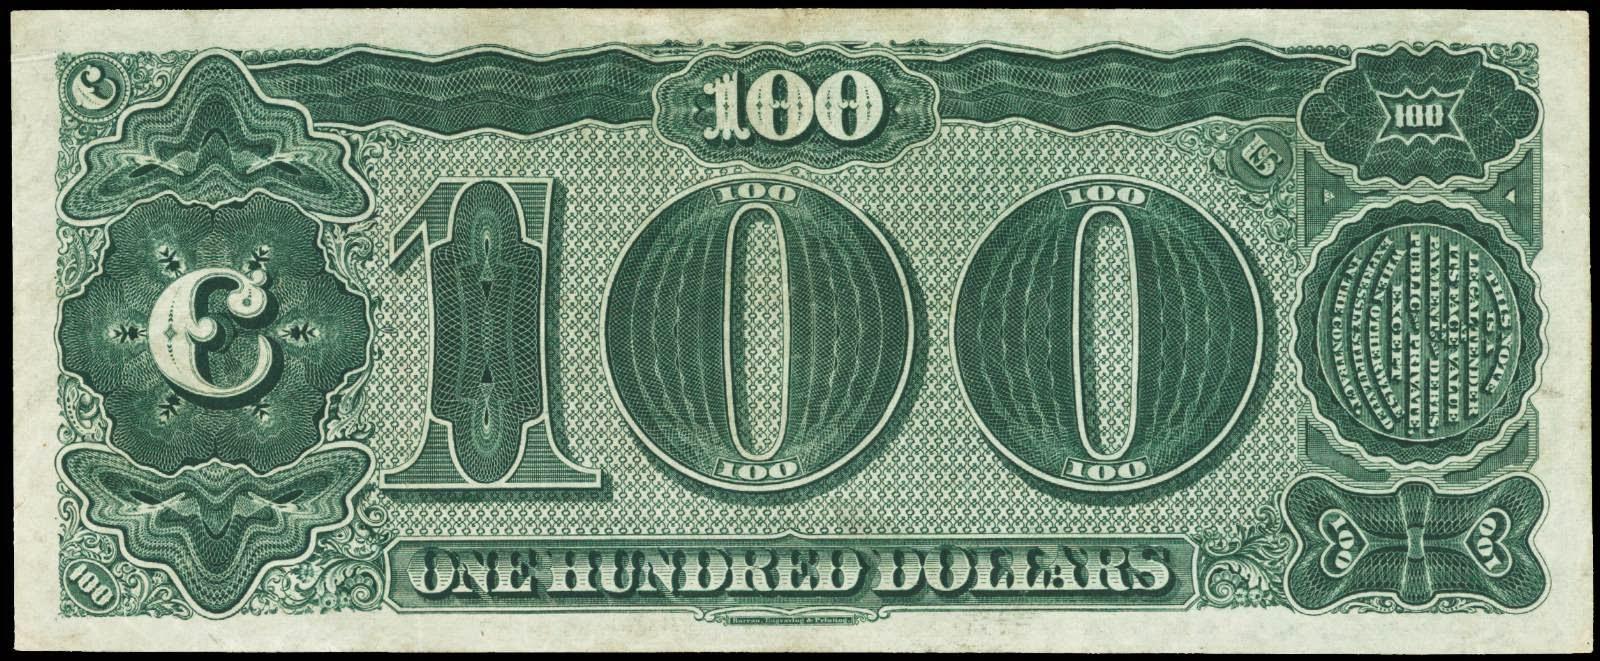 1890 100 Dollar Treasury Coin Note Watermelon